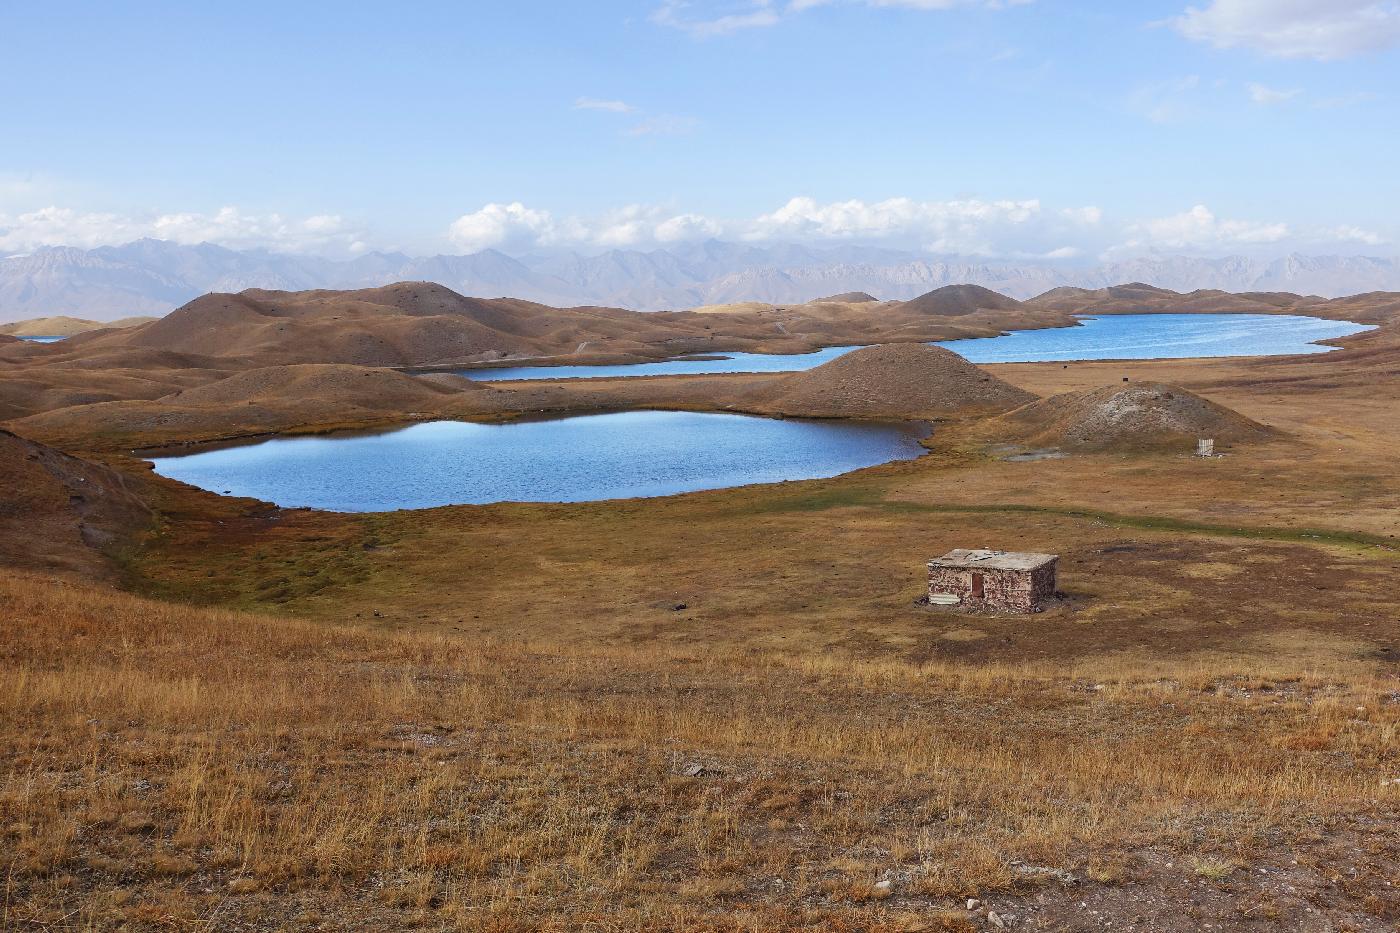 Sary Mogol Khirghizstan